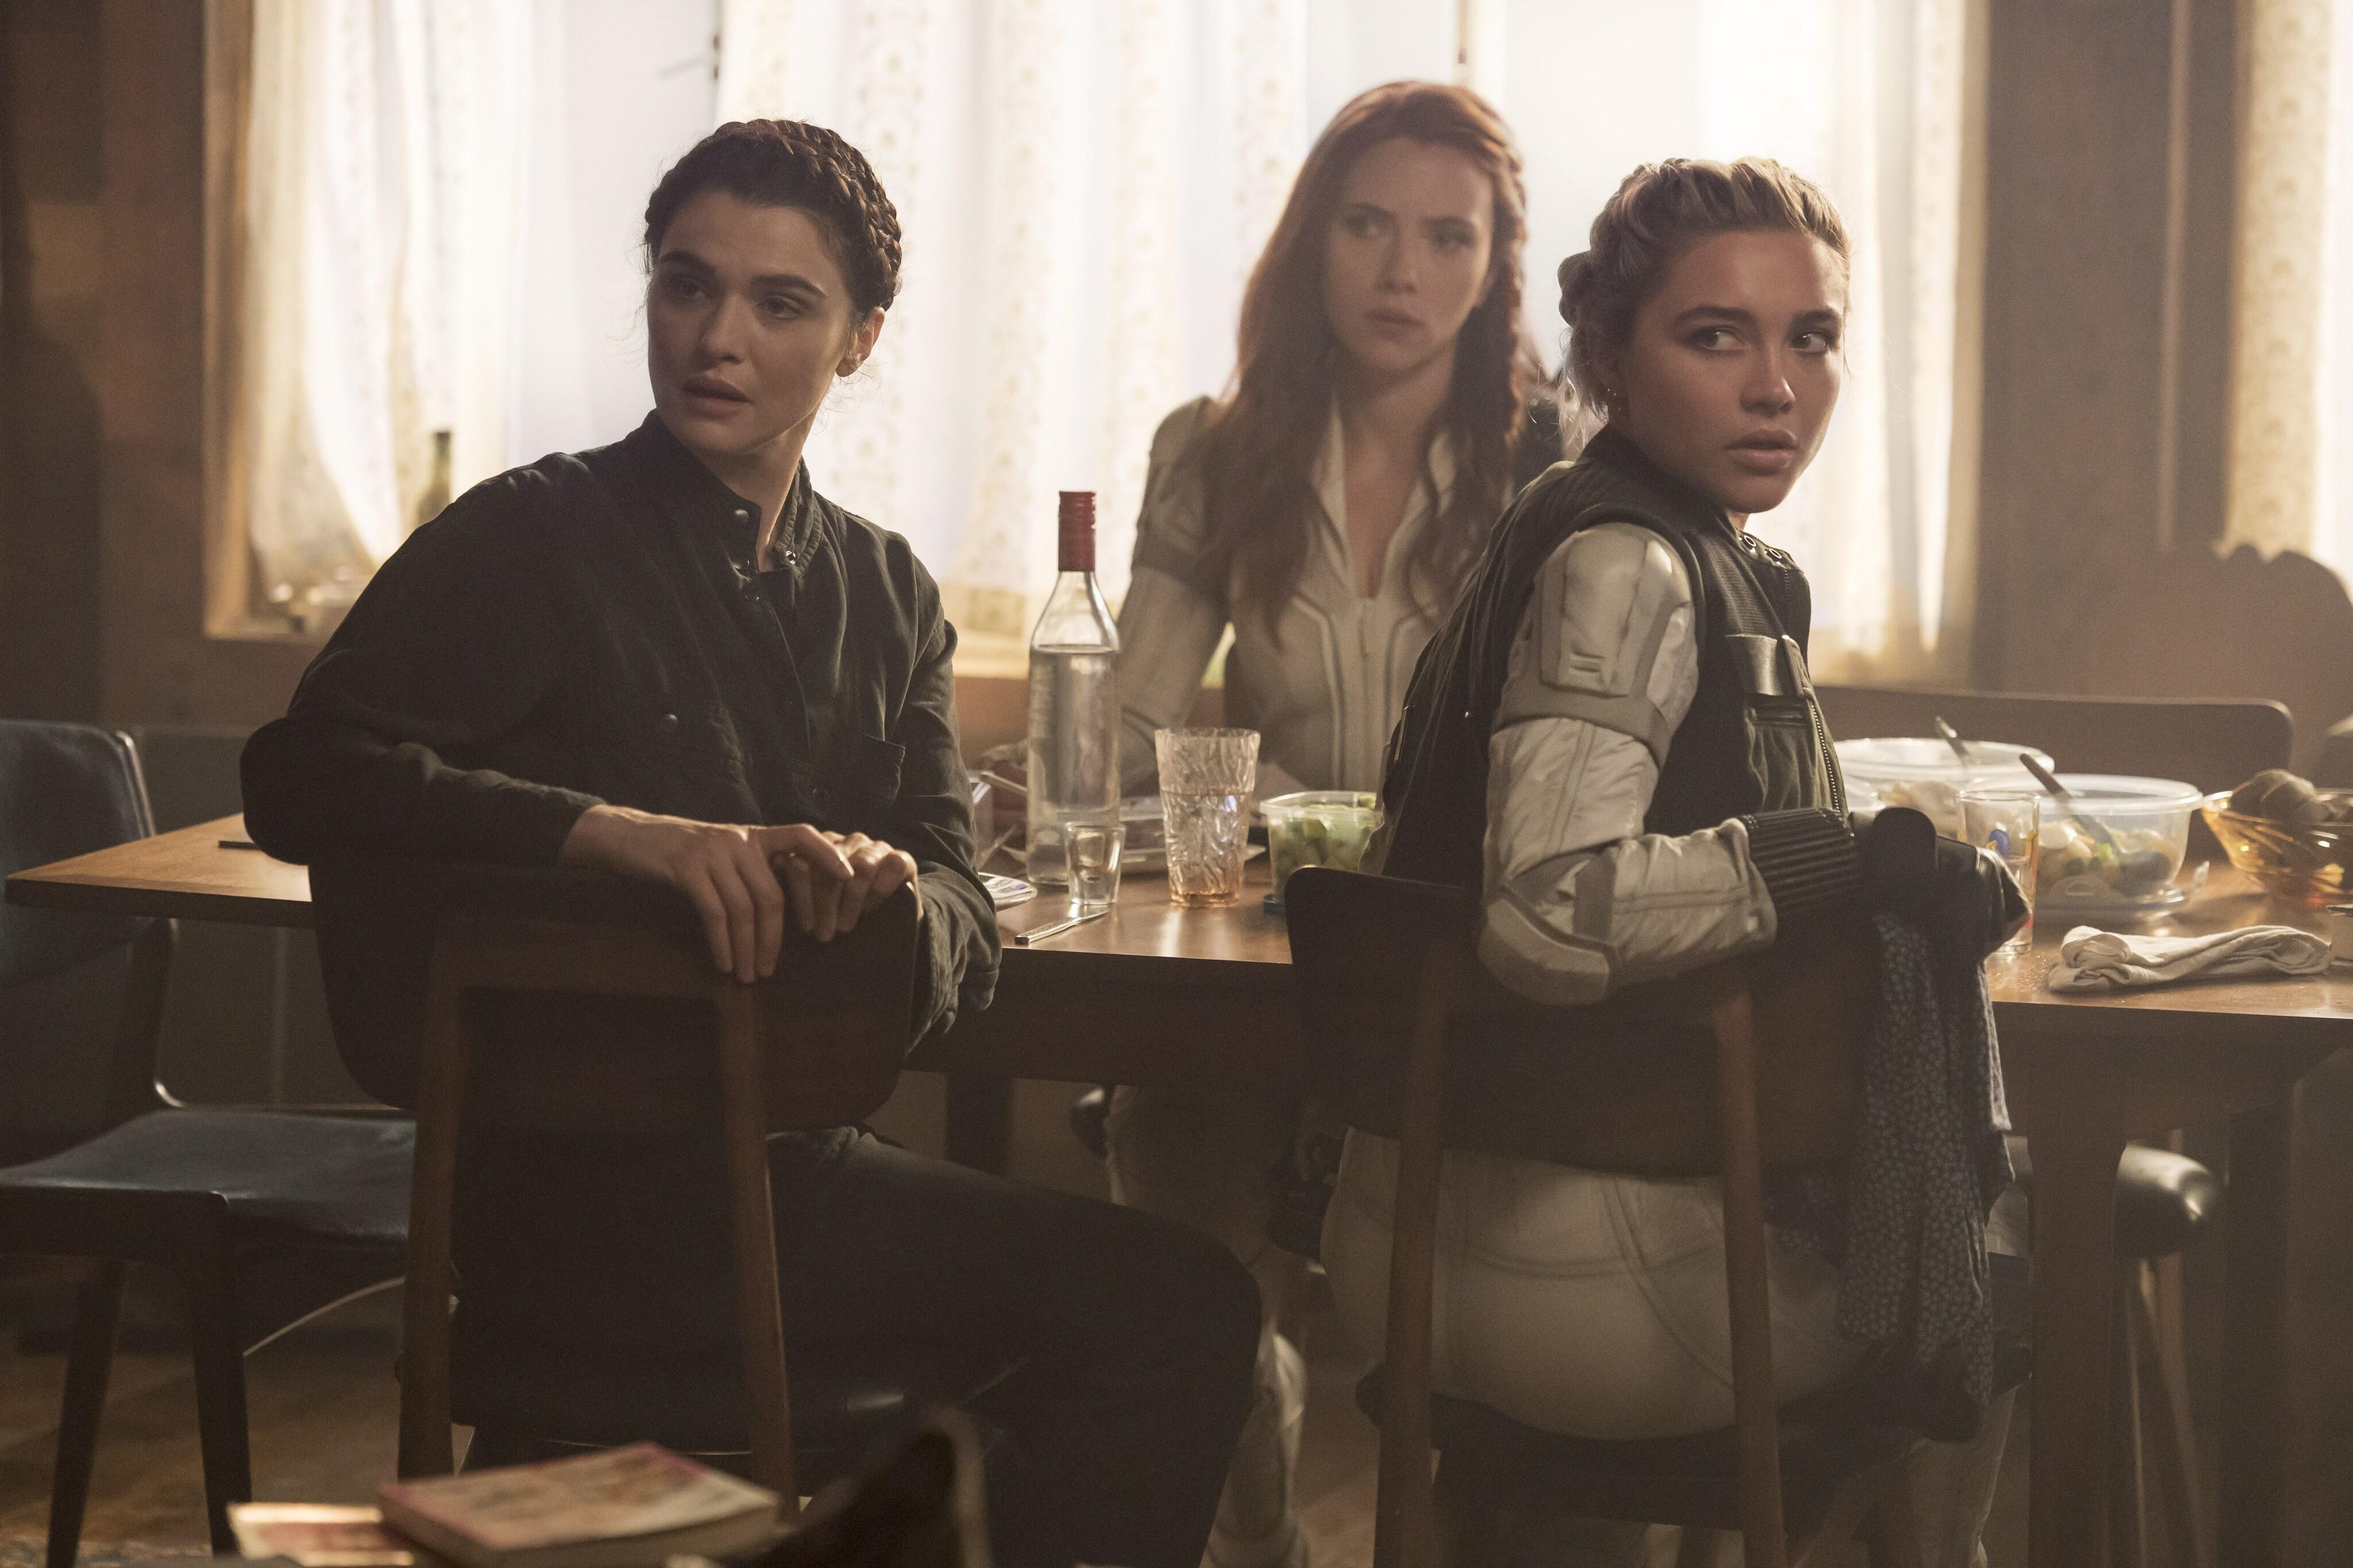 Rachel Weisz, Scarlett Johansson and Florence Pugh Behind-the-Scenes of Black Widow